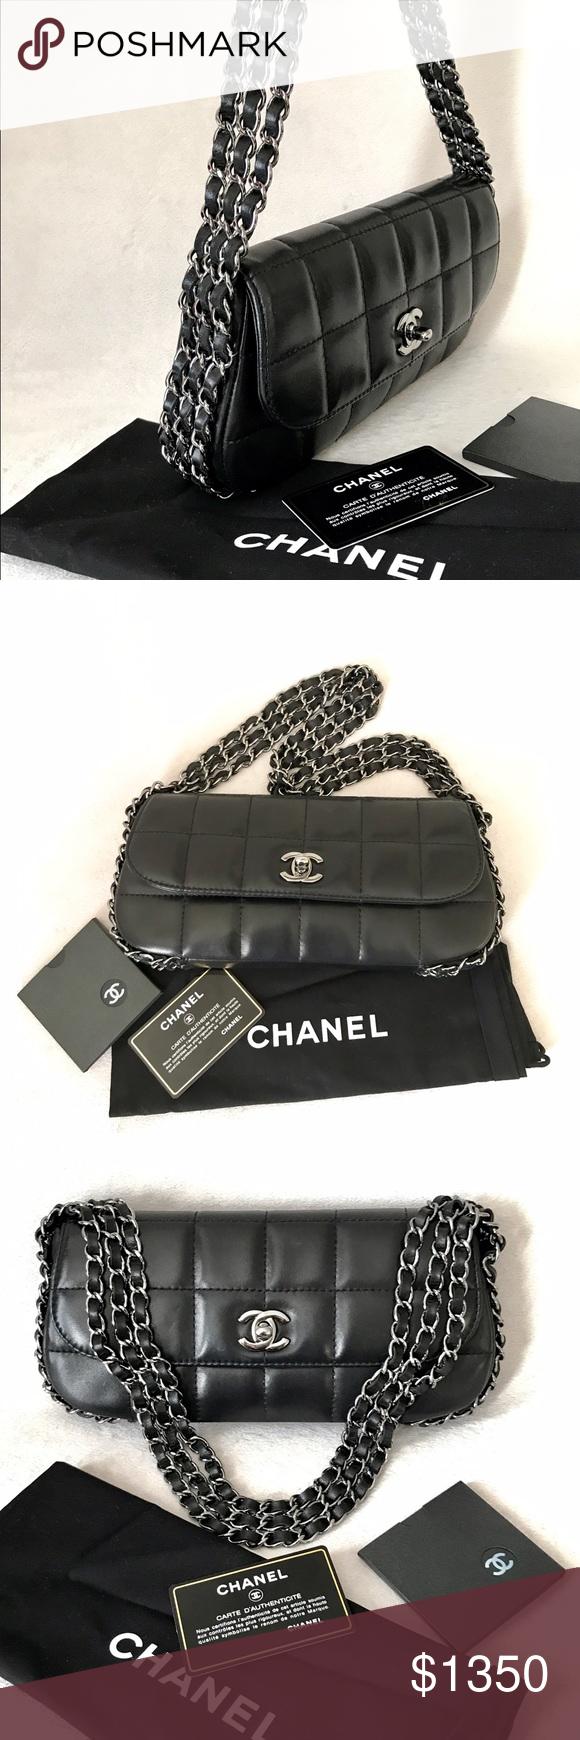 3b4fa1676d29e5 CHANEL Black Square Quilt Multichain Mini Flapbag Authentic Chanel Runaway Black  Quilted Lambskin Multi chain Mini